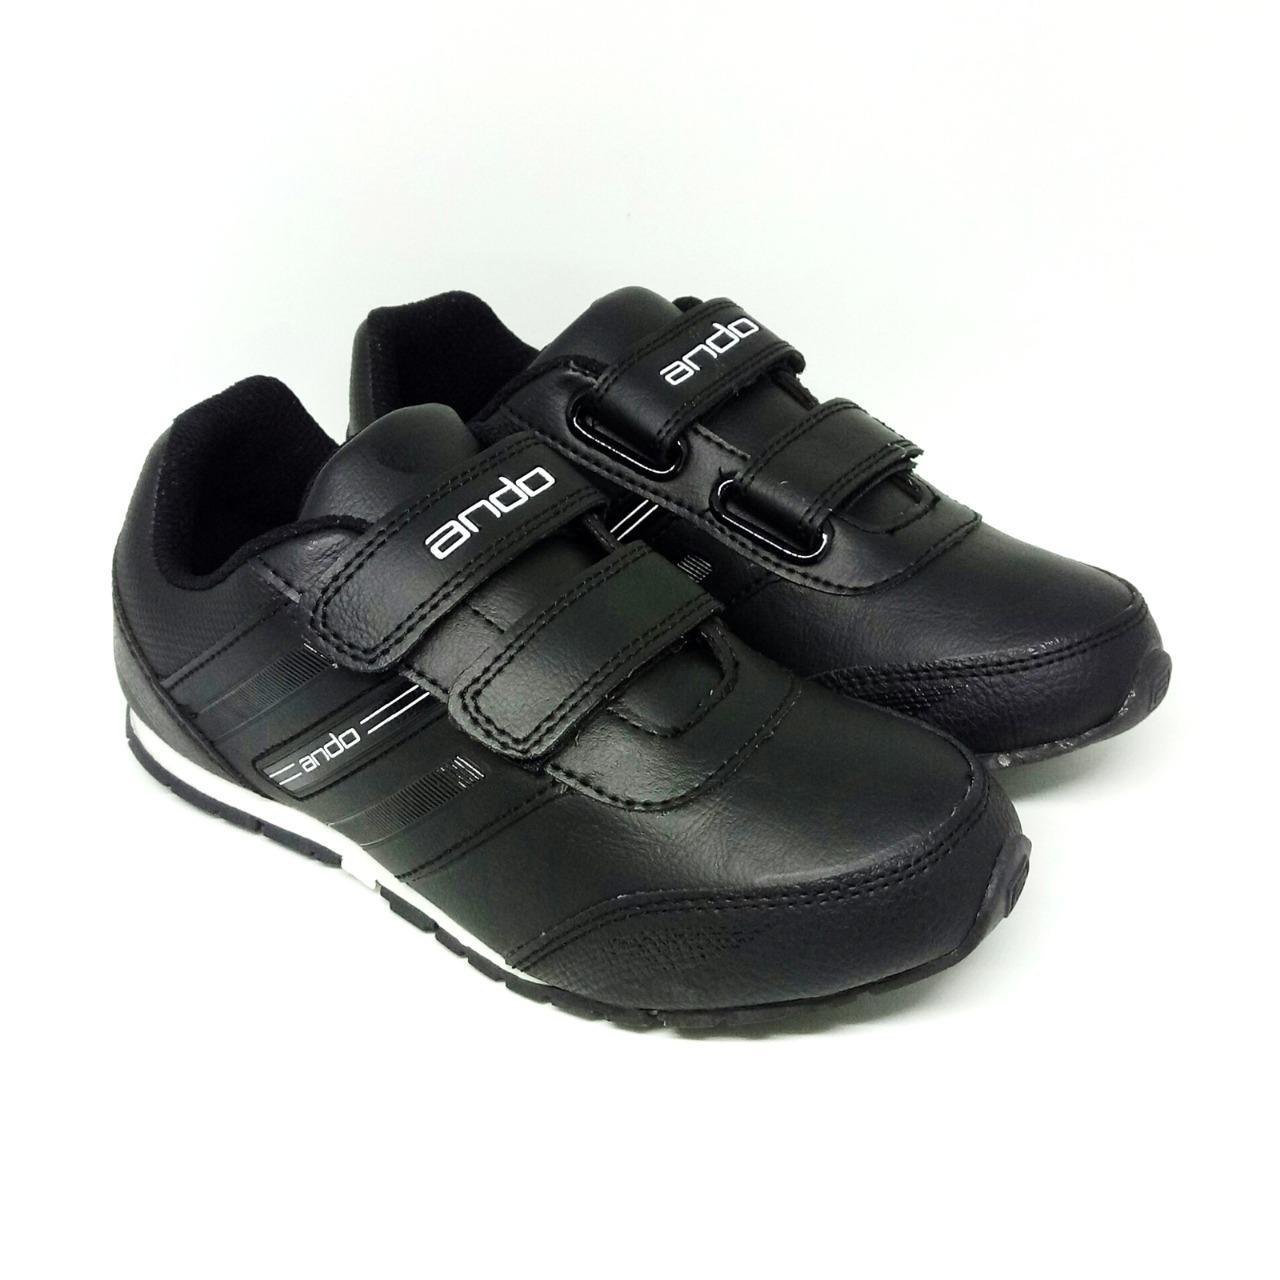 Jual Alas Kaki Ando Terbaru Sepatu Sekolah Anak Sport  Biru Navy Oren